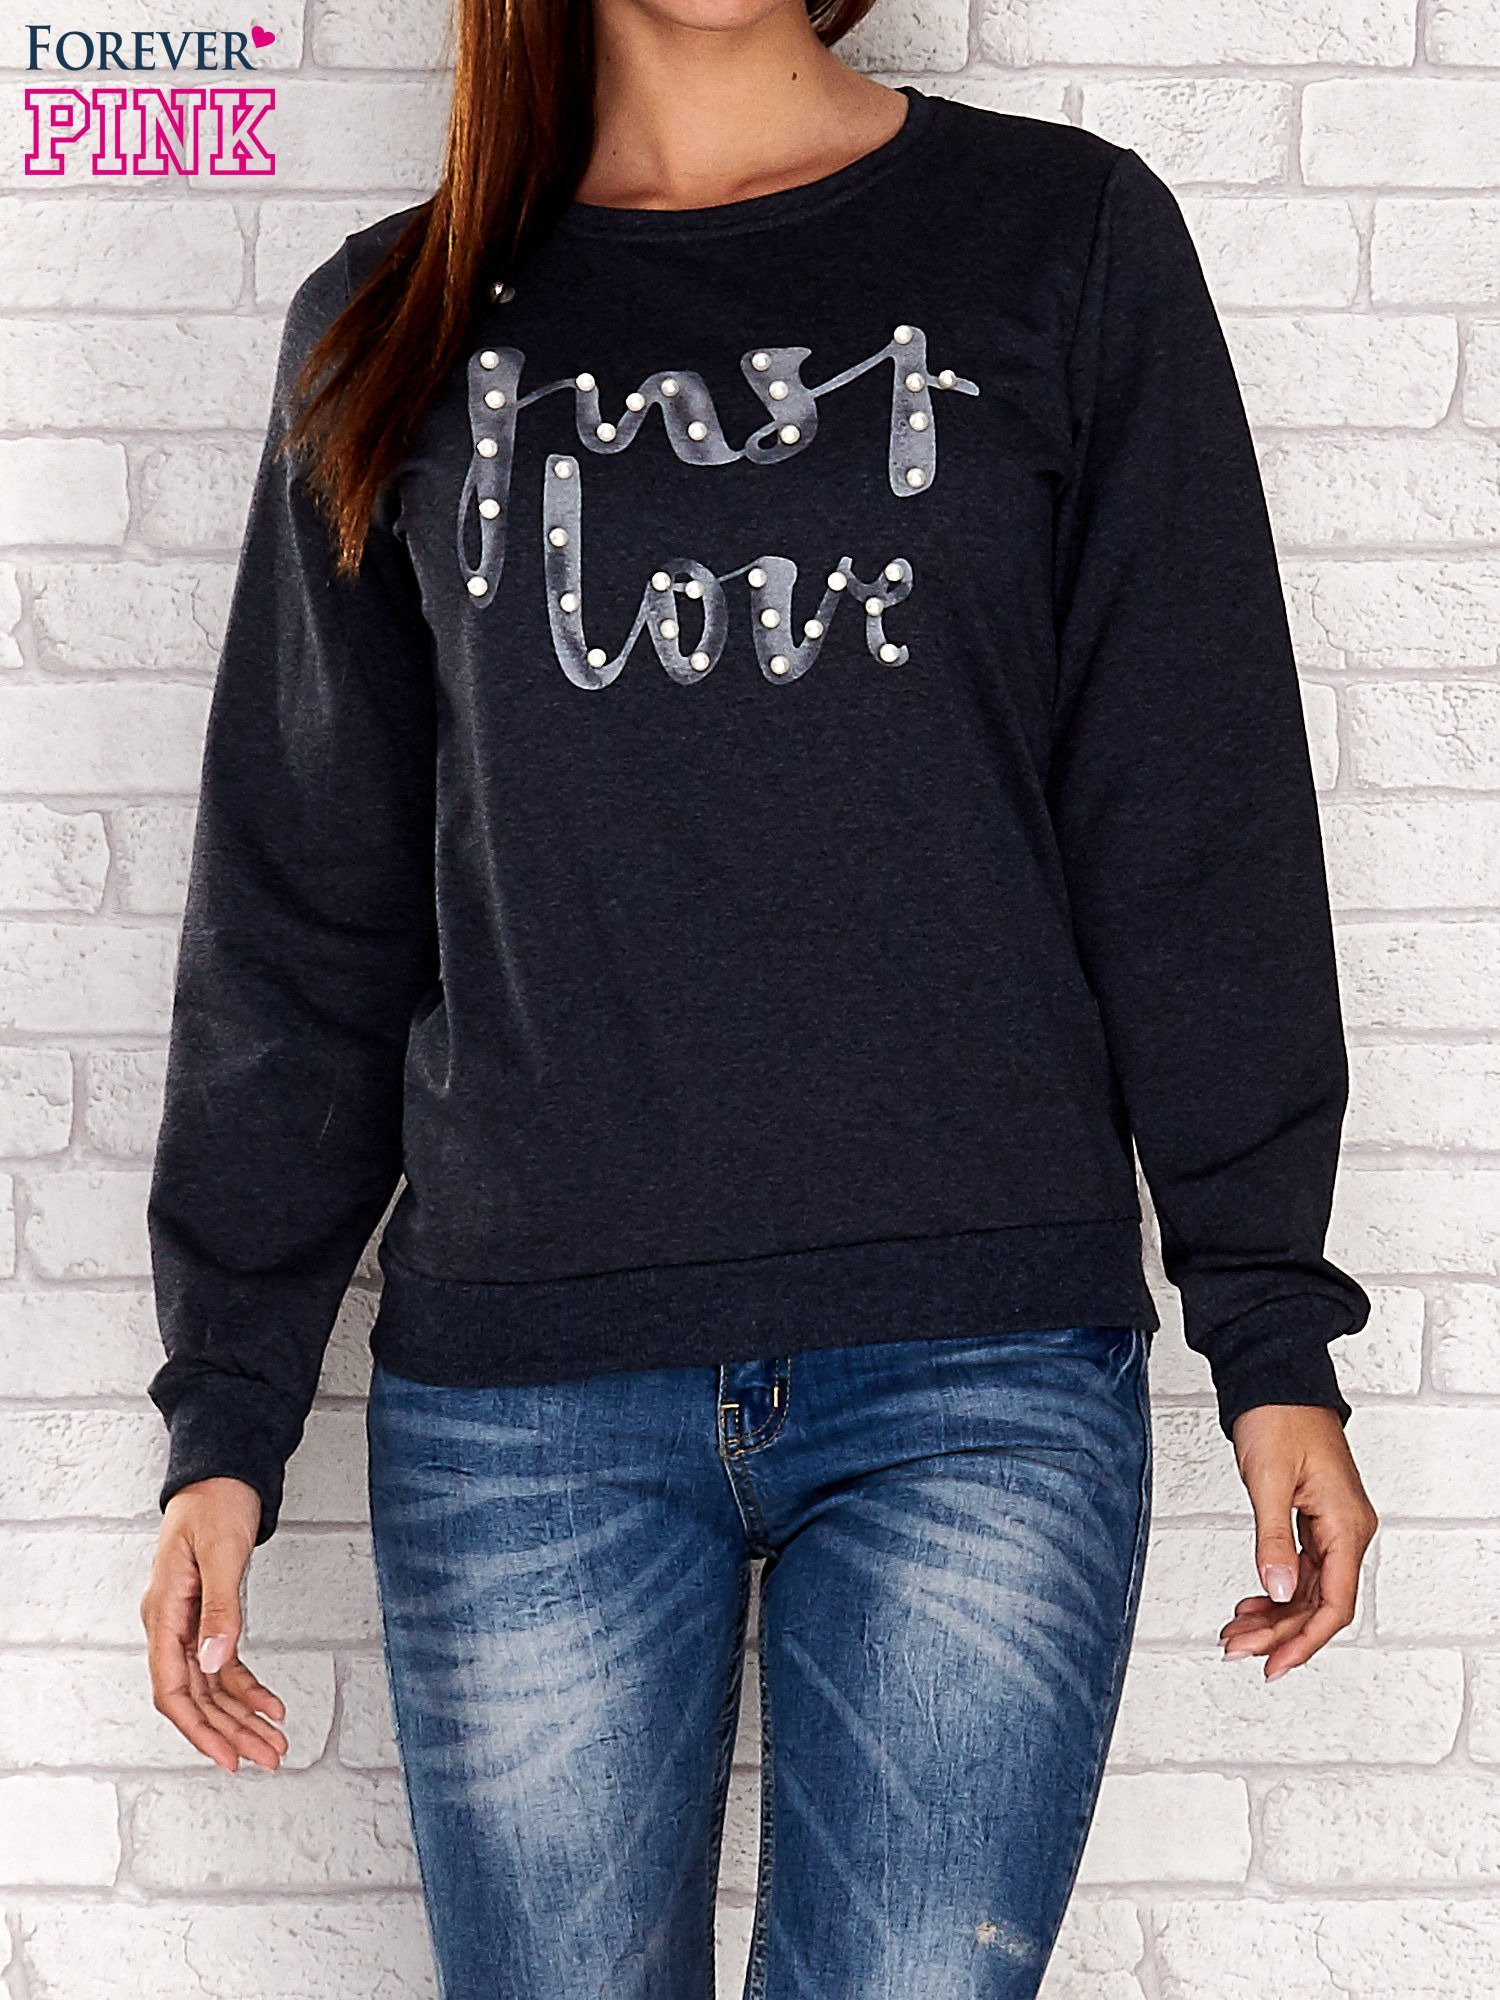 NIebieska bluza z napisem JUST LOVE i perełkami                                  zdj.                                  1